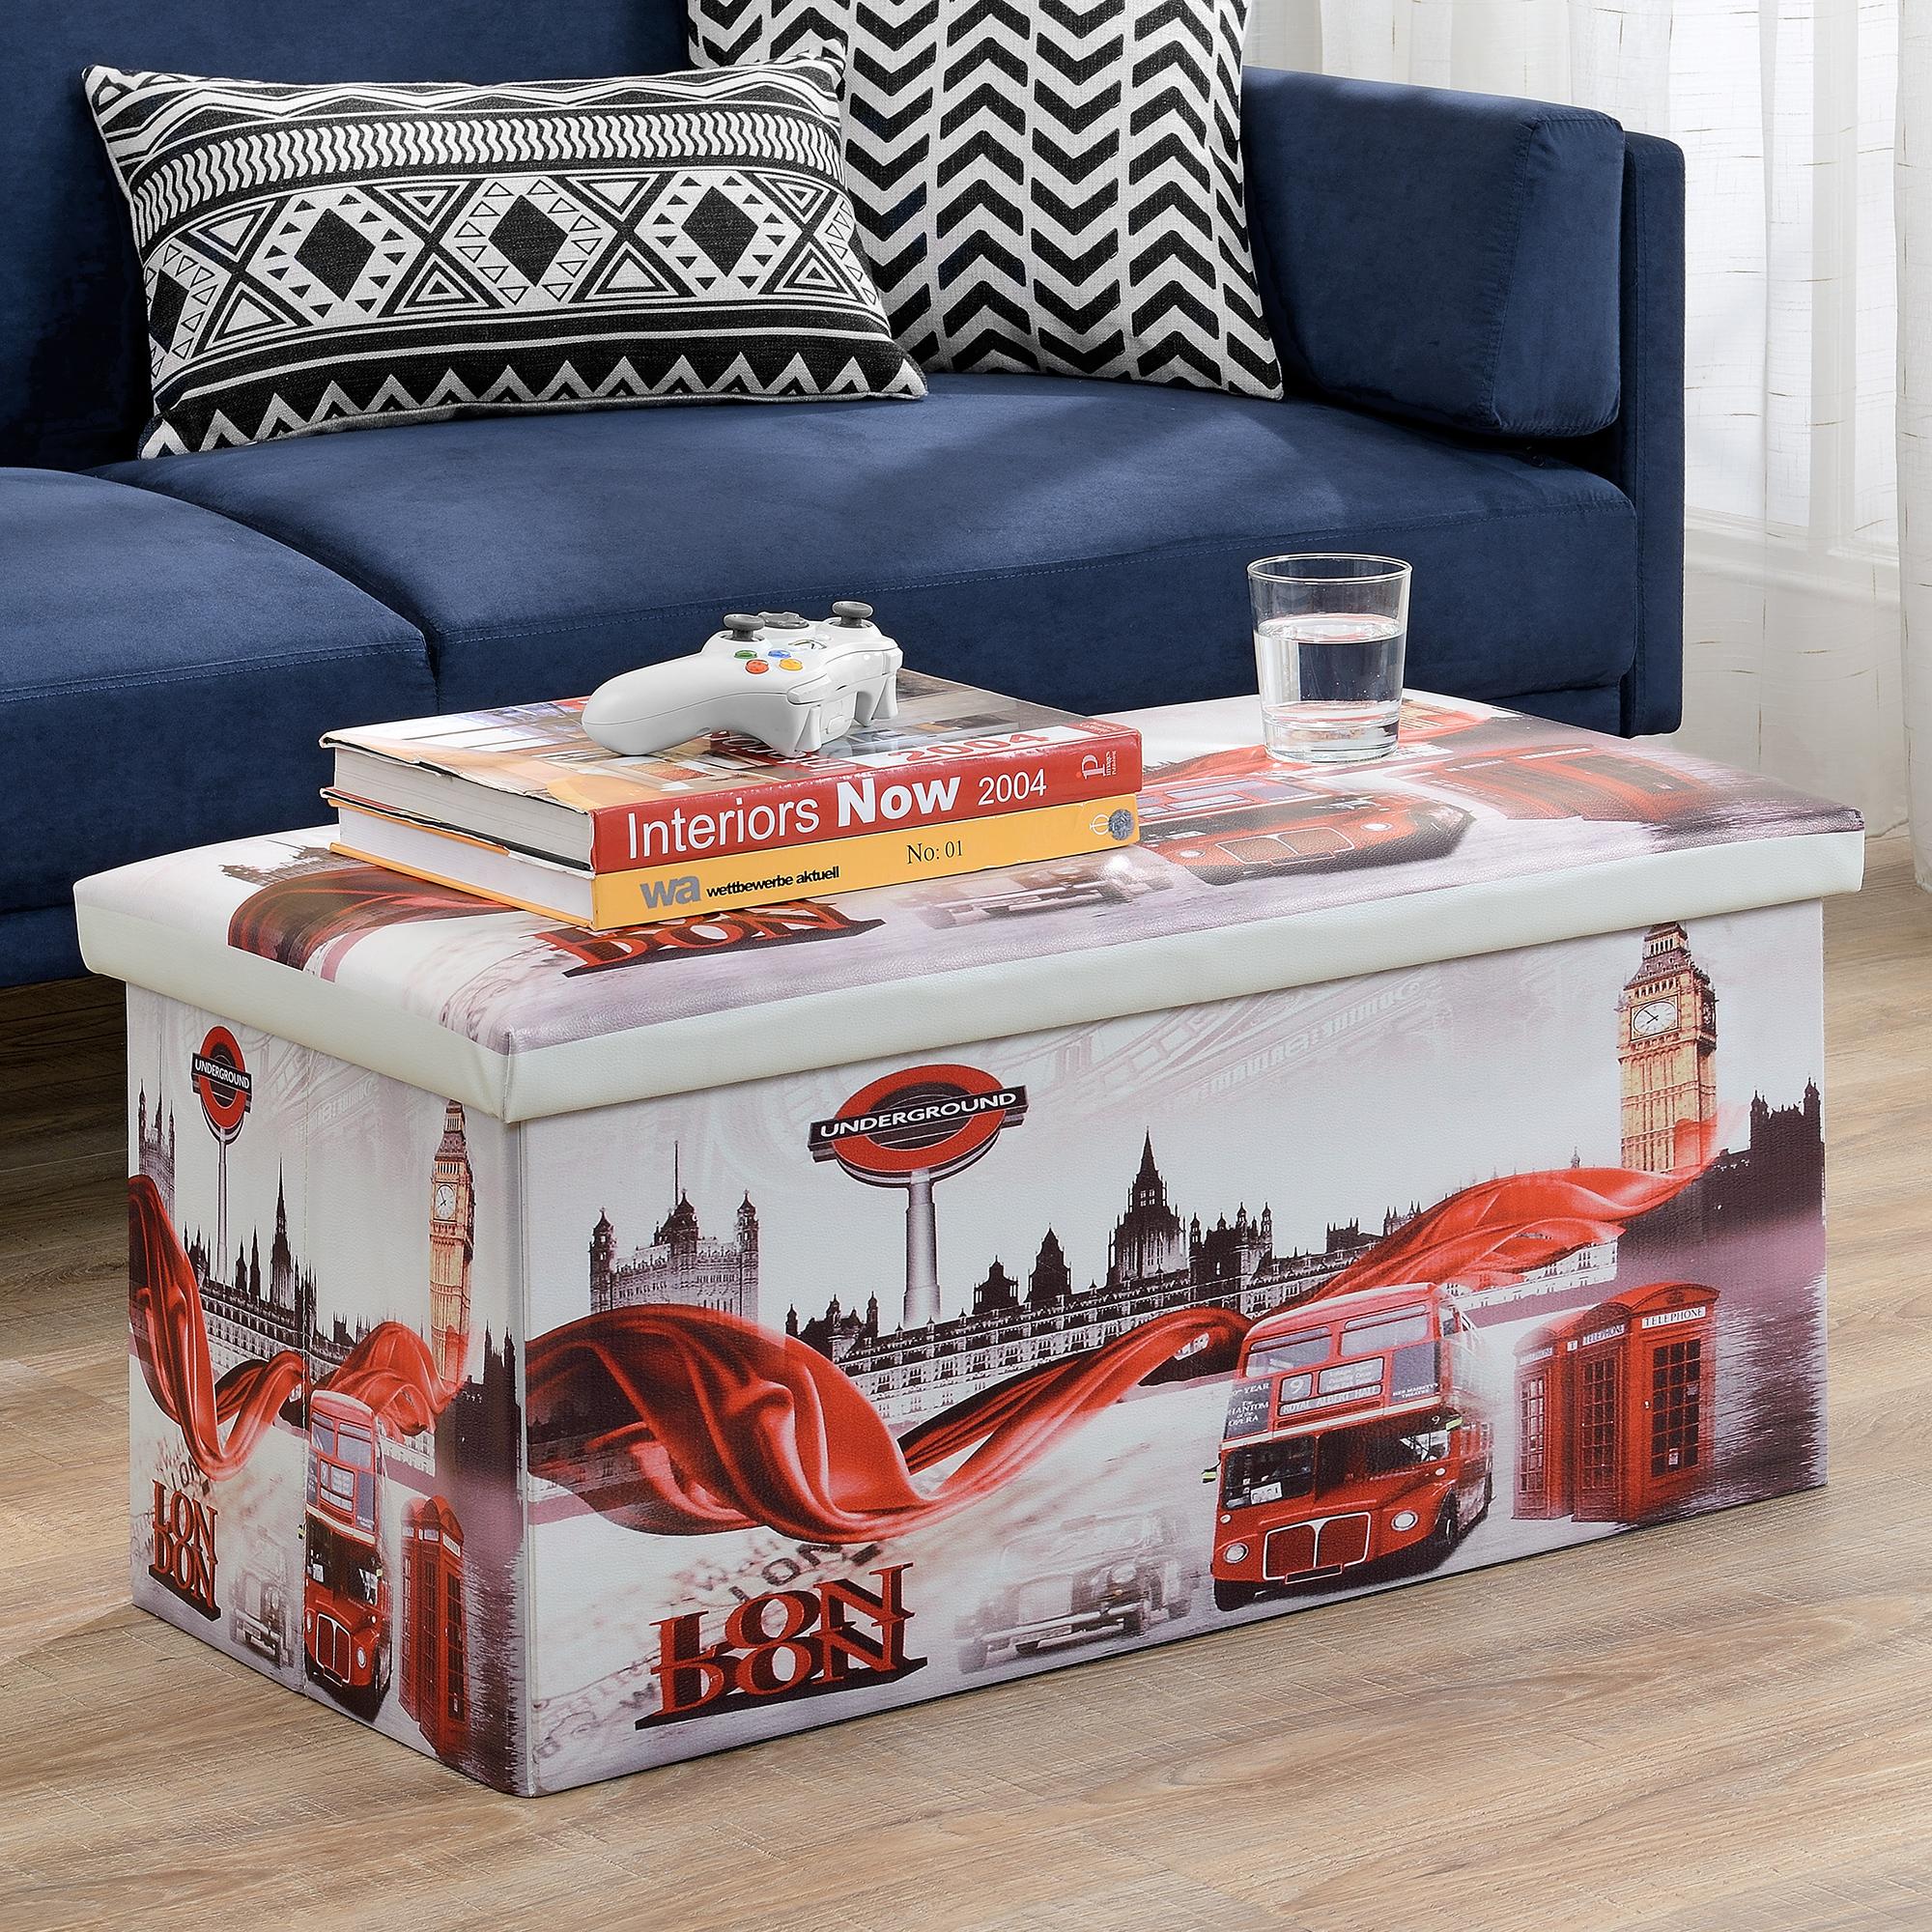 sitzhocker london 76x38x38cm sitz bank aufbewahrungsbox truhe hocker ebay. Black Bedroom Furniture Sets. Home Design Ideas